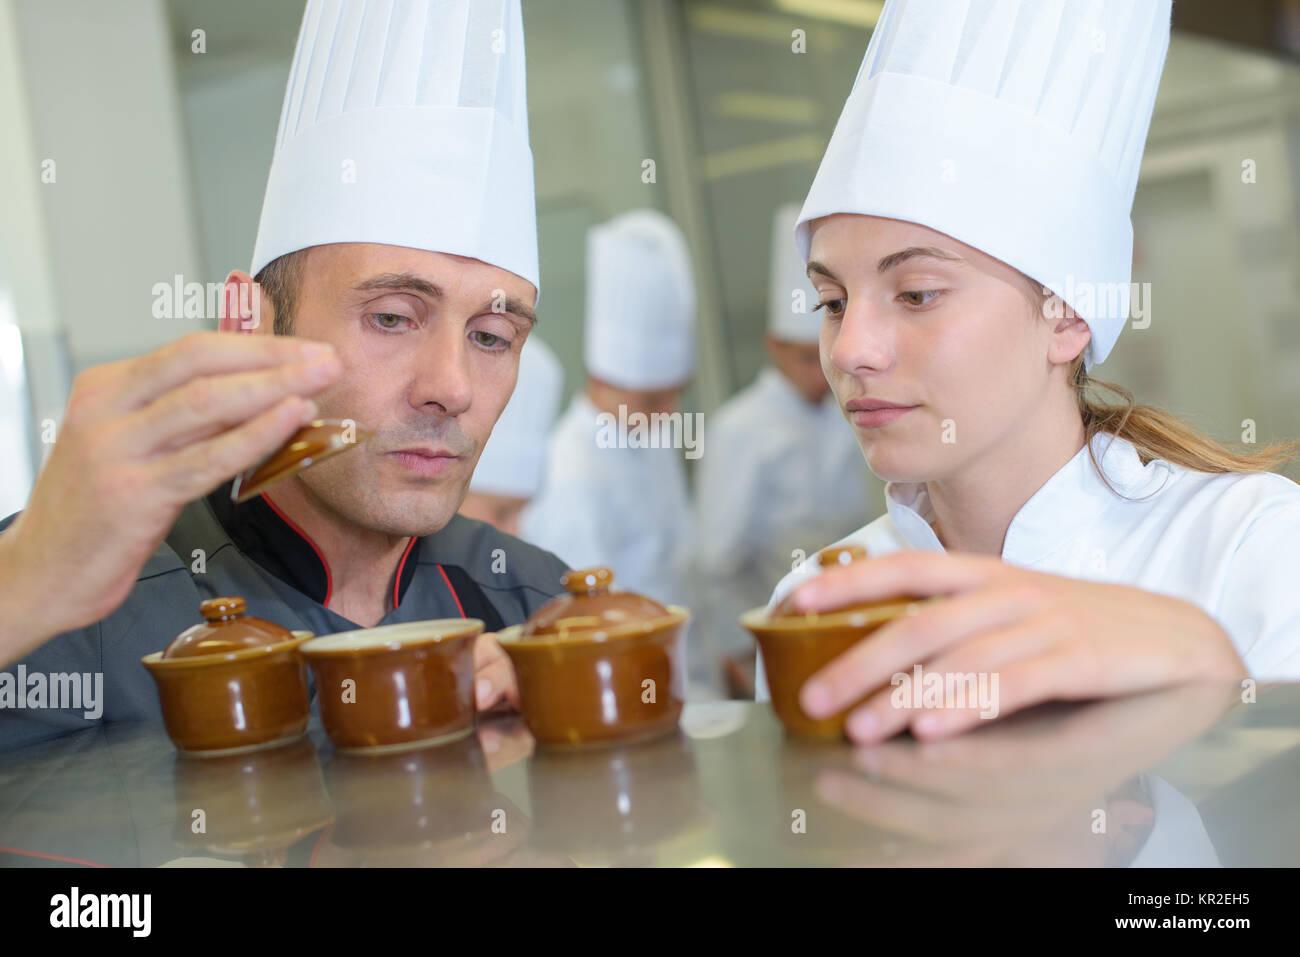 Chef holding lid of ramekin pot - Stock Image